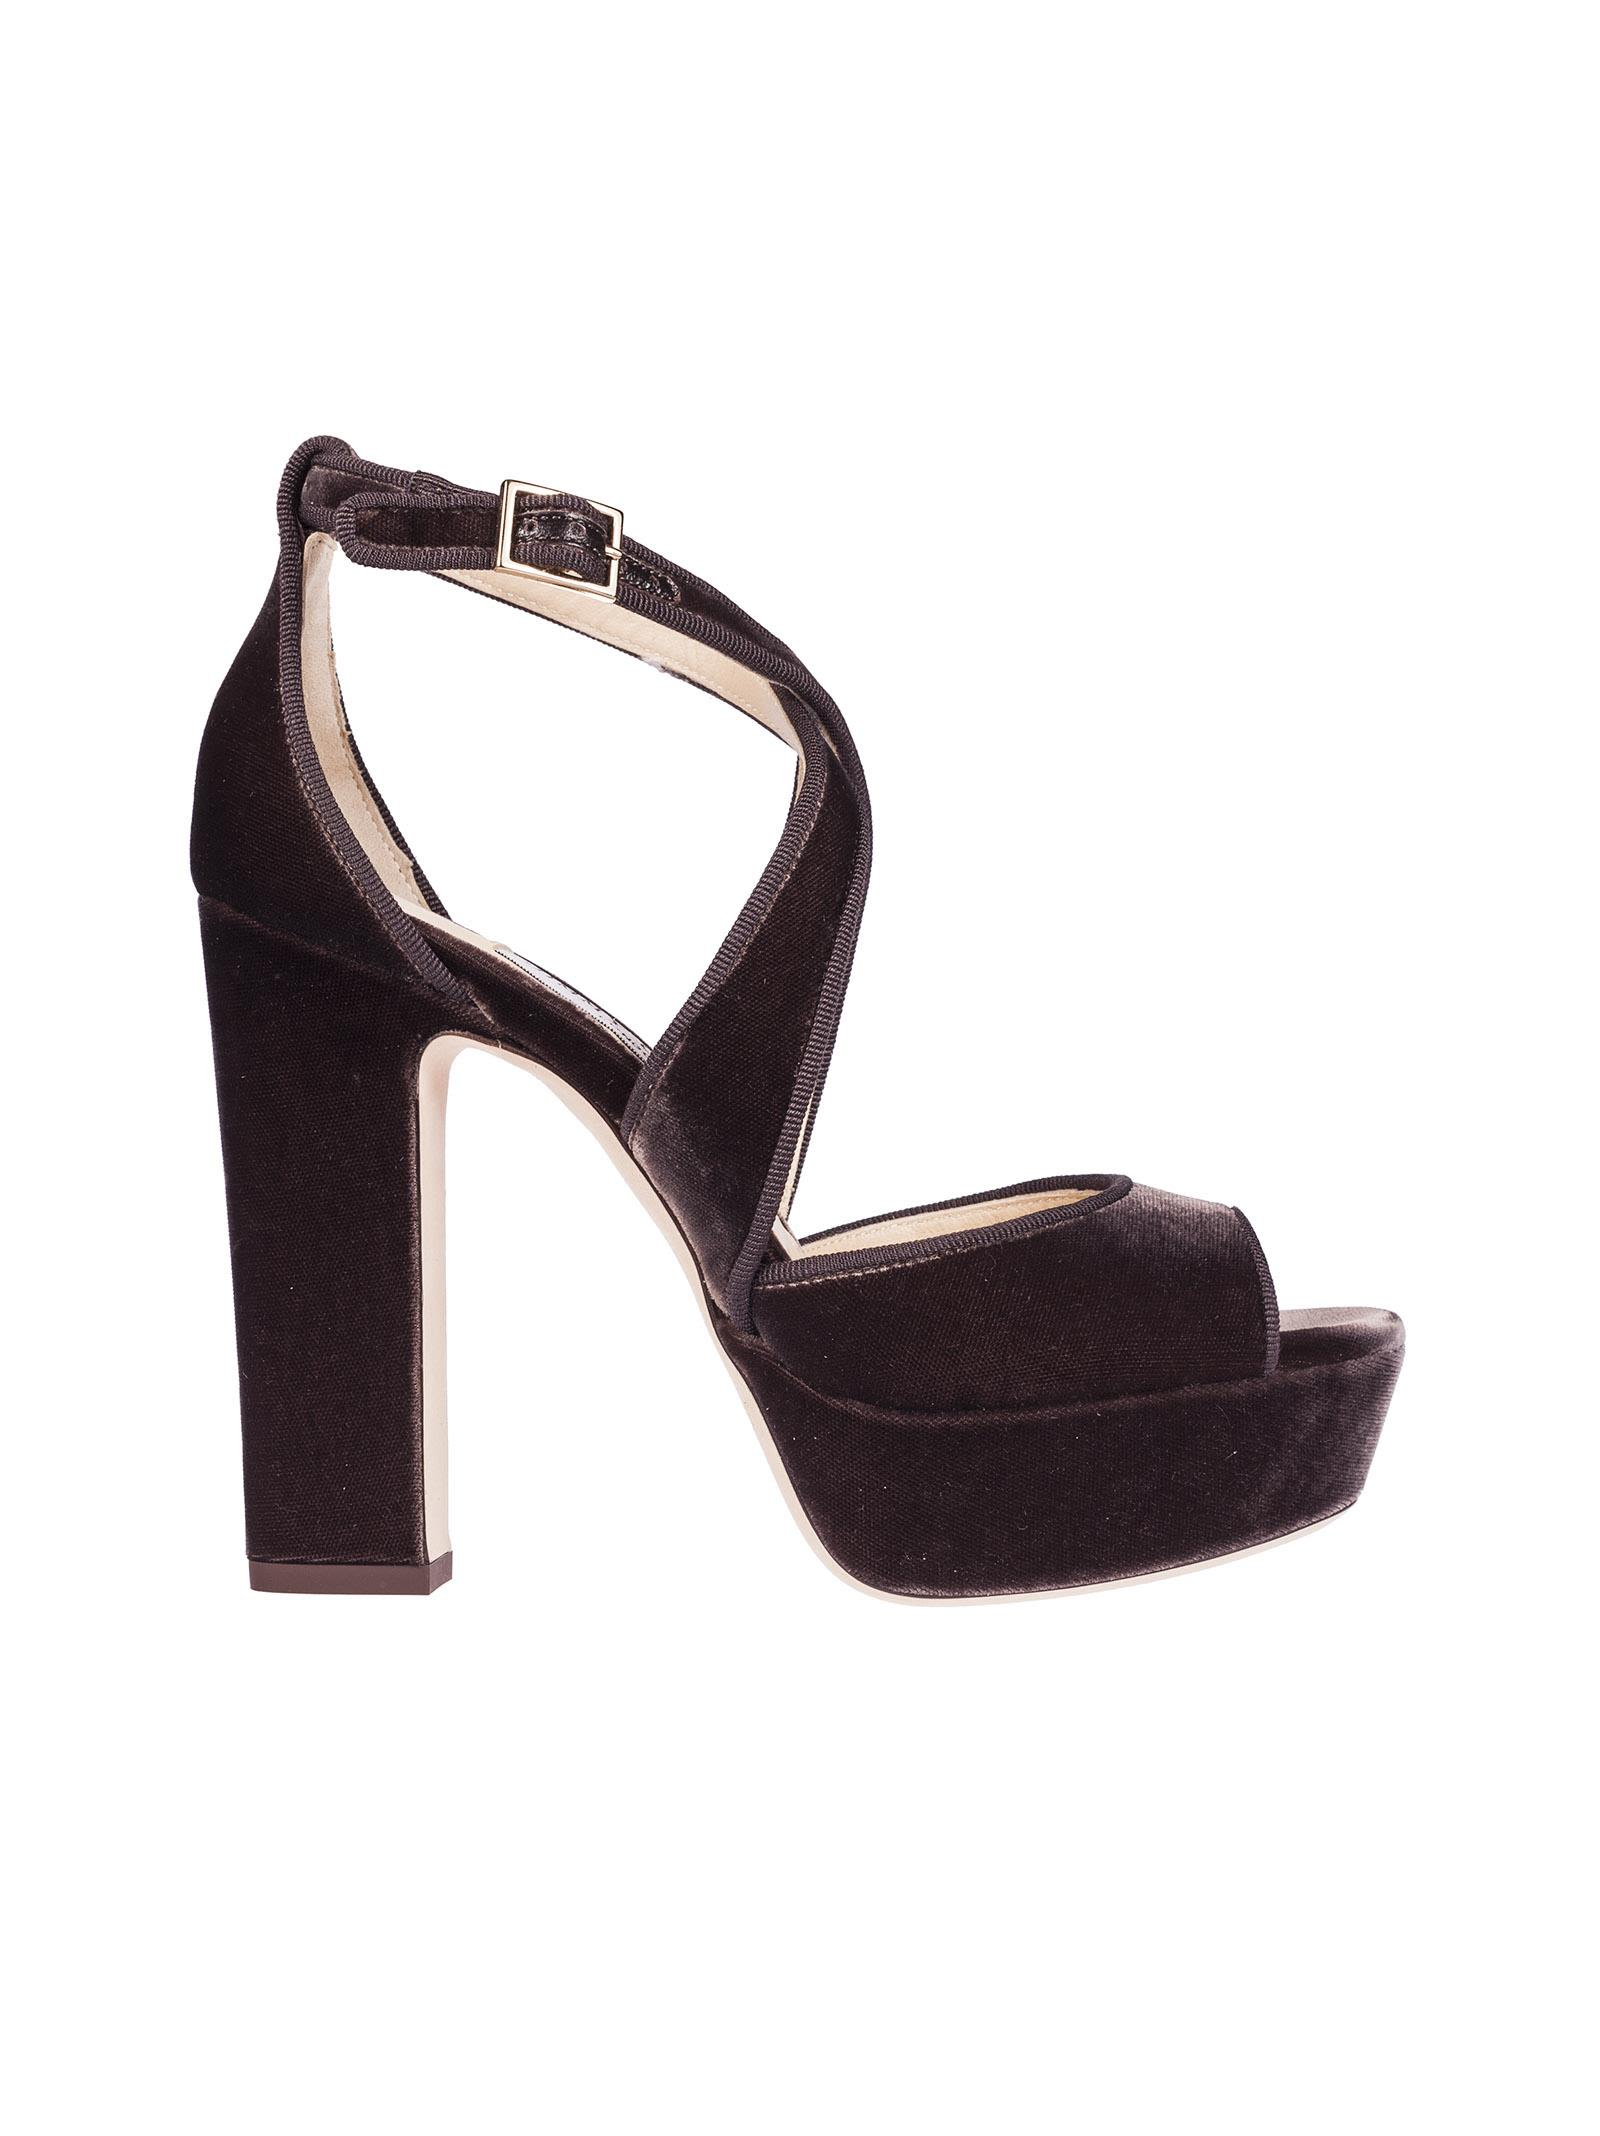 Jimmy Choo April 20 Platform Sandals